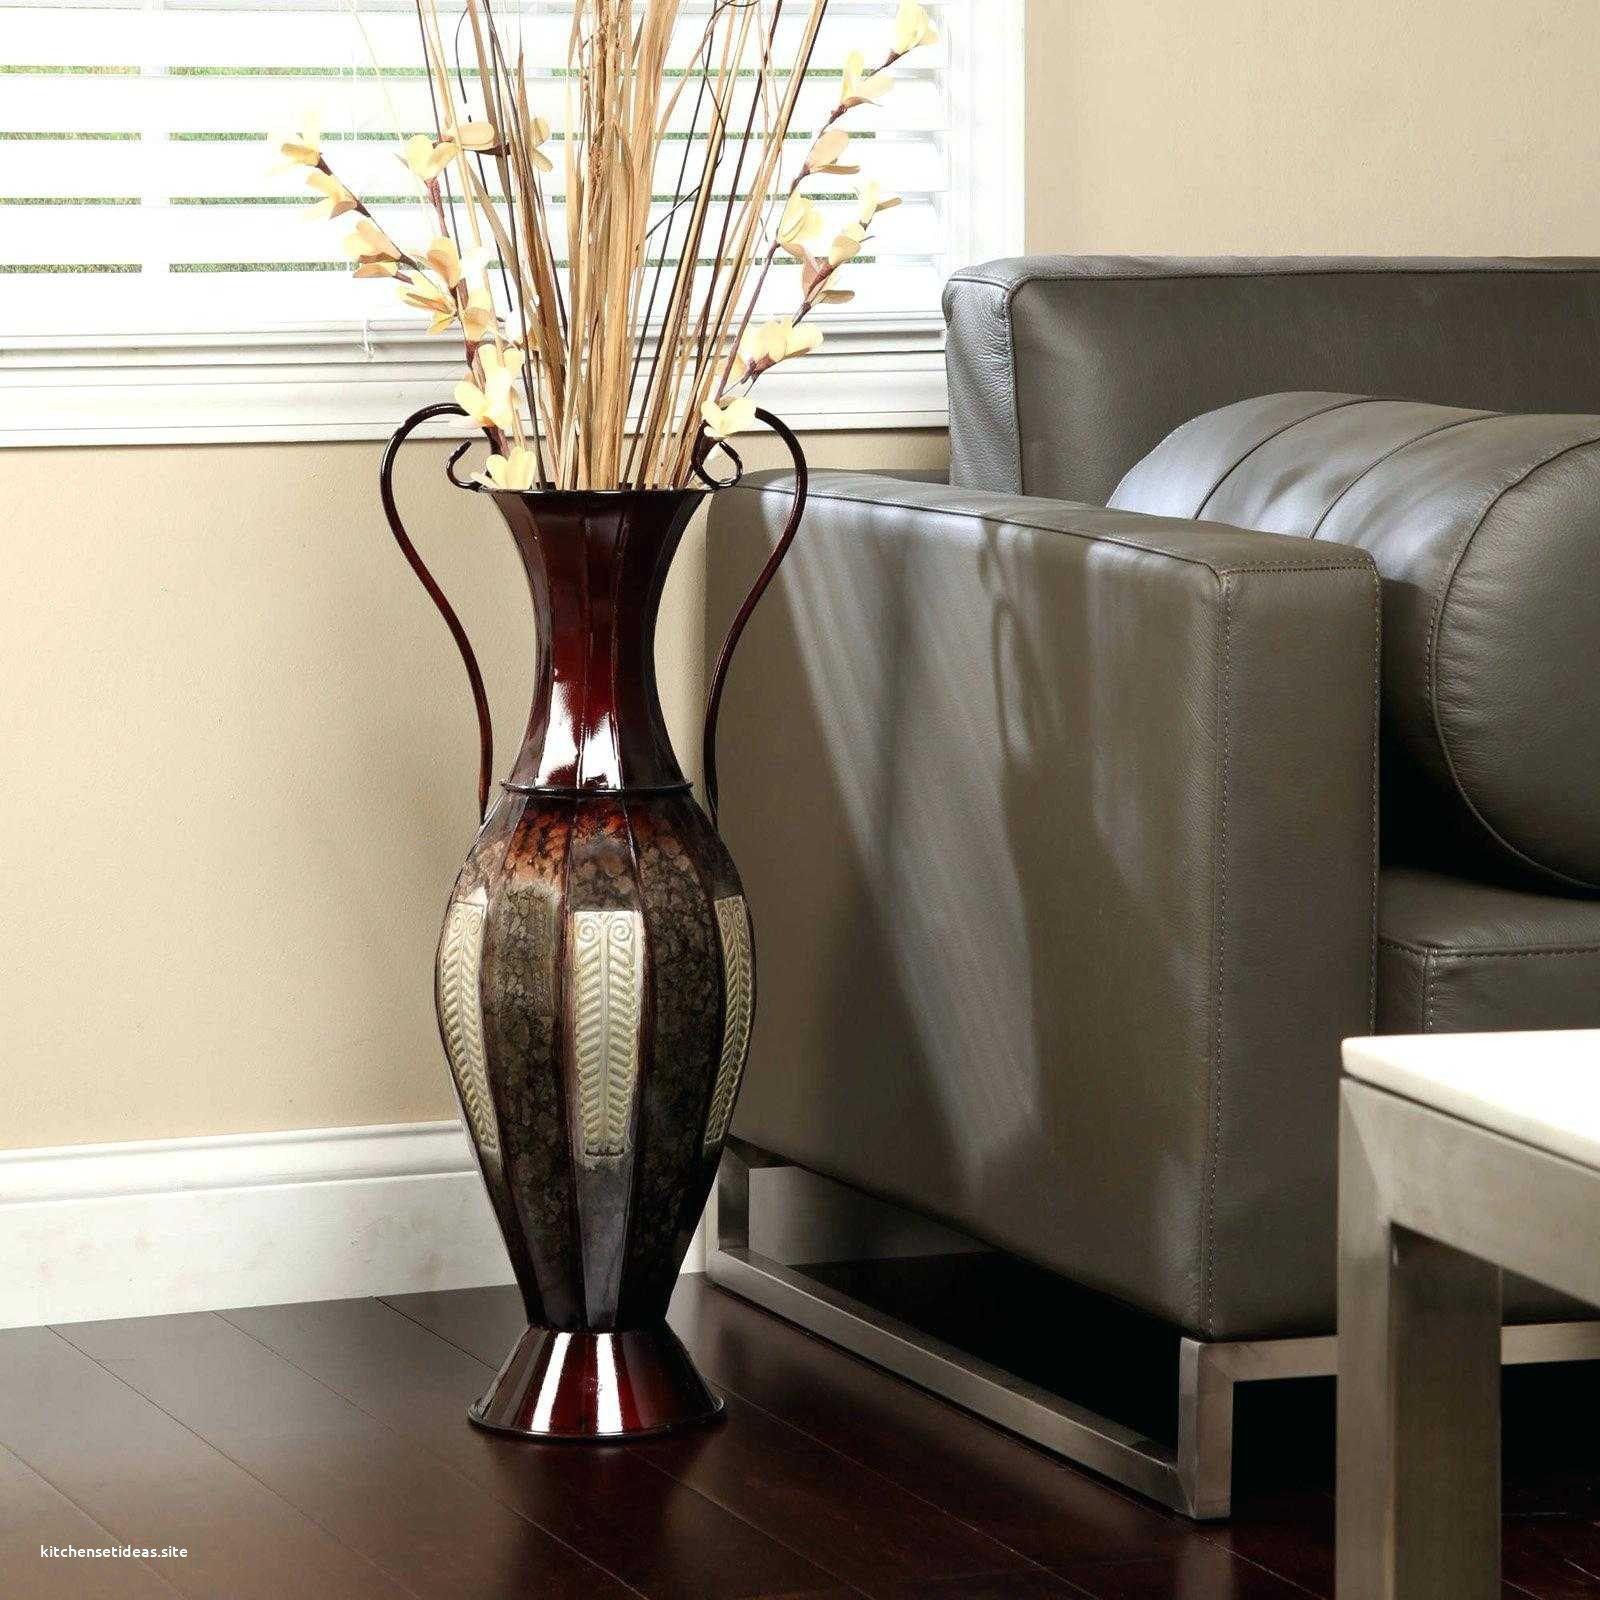 Contemporary Living Room Overhauls March 2019 Floor Vase Decor Large Floor Vase Home Decor Vases #standing #vase #for #living #room